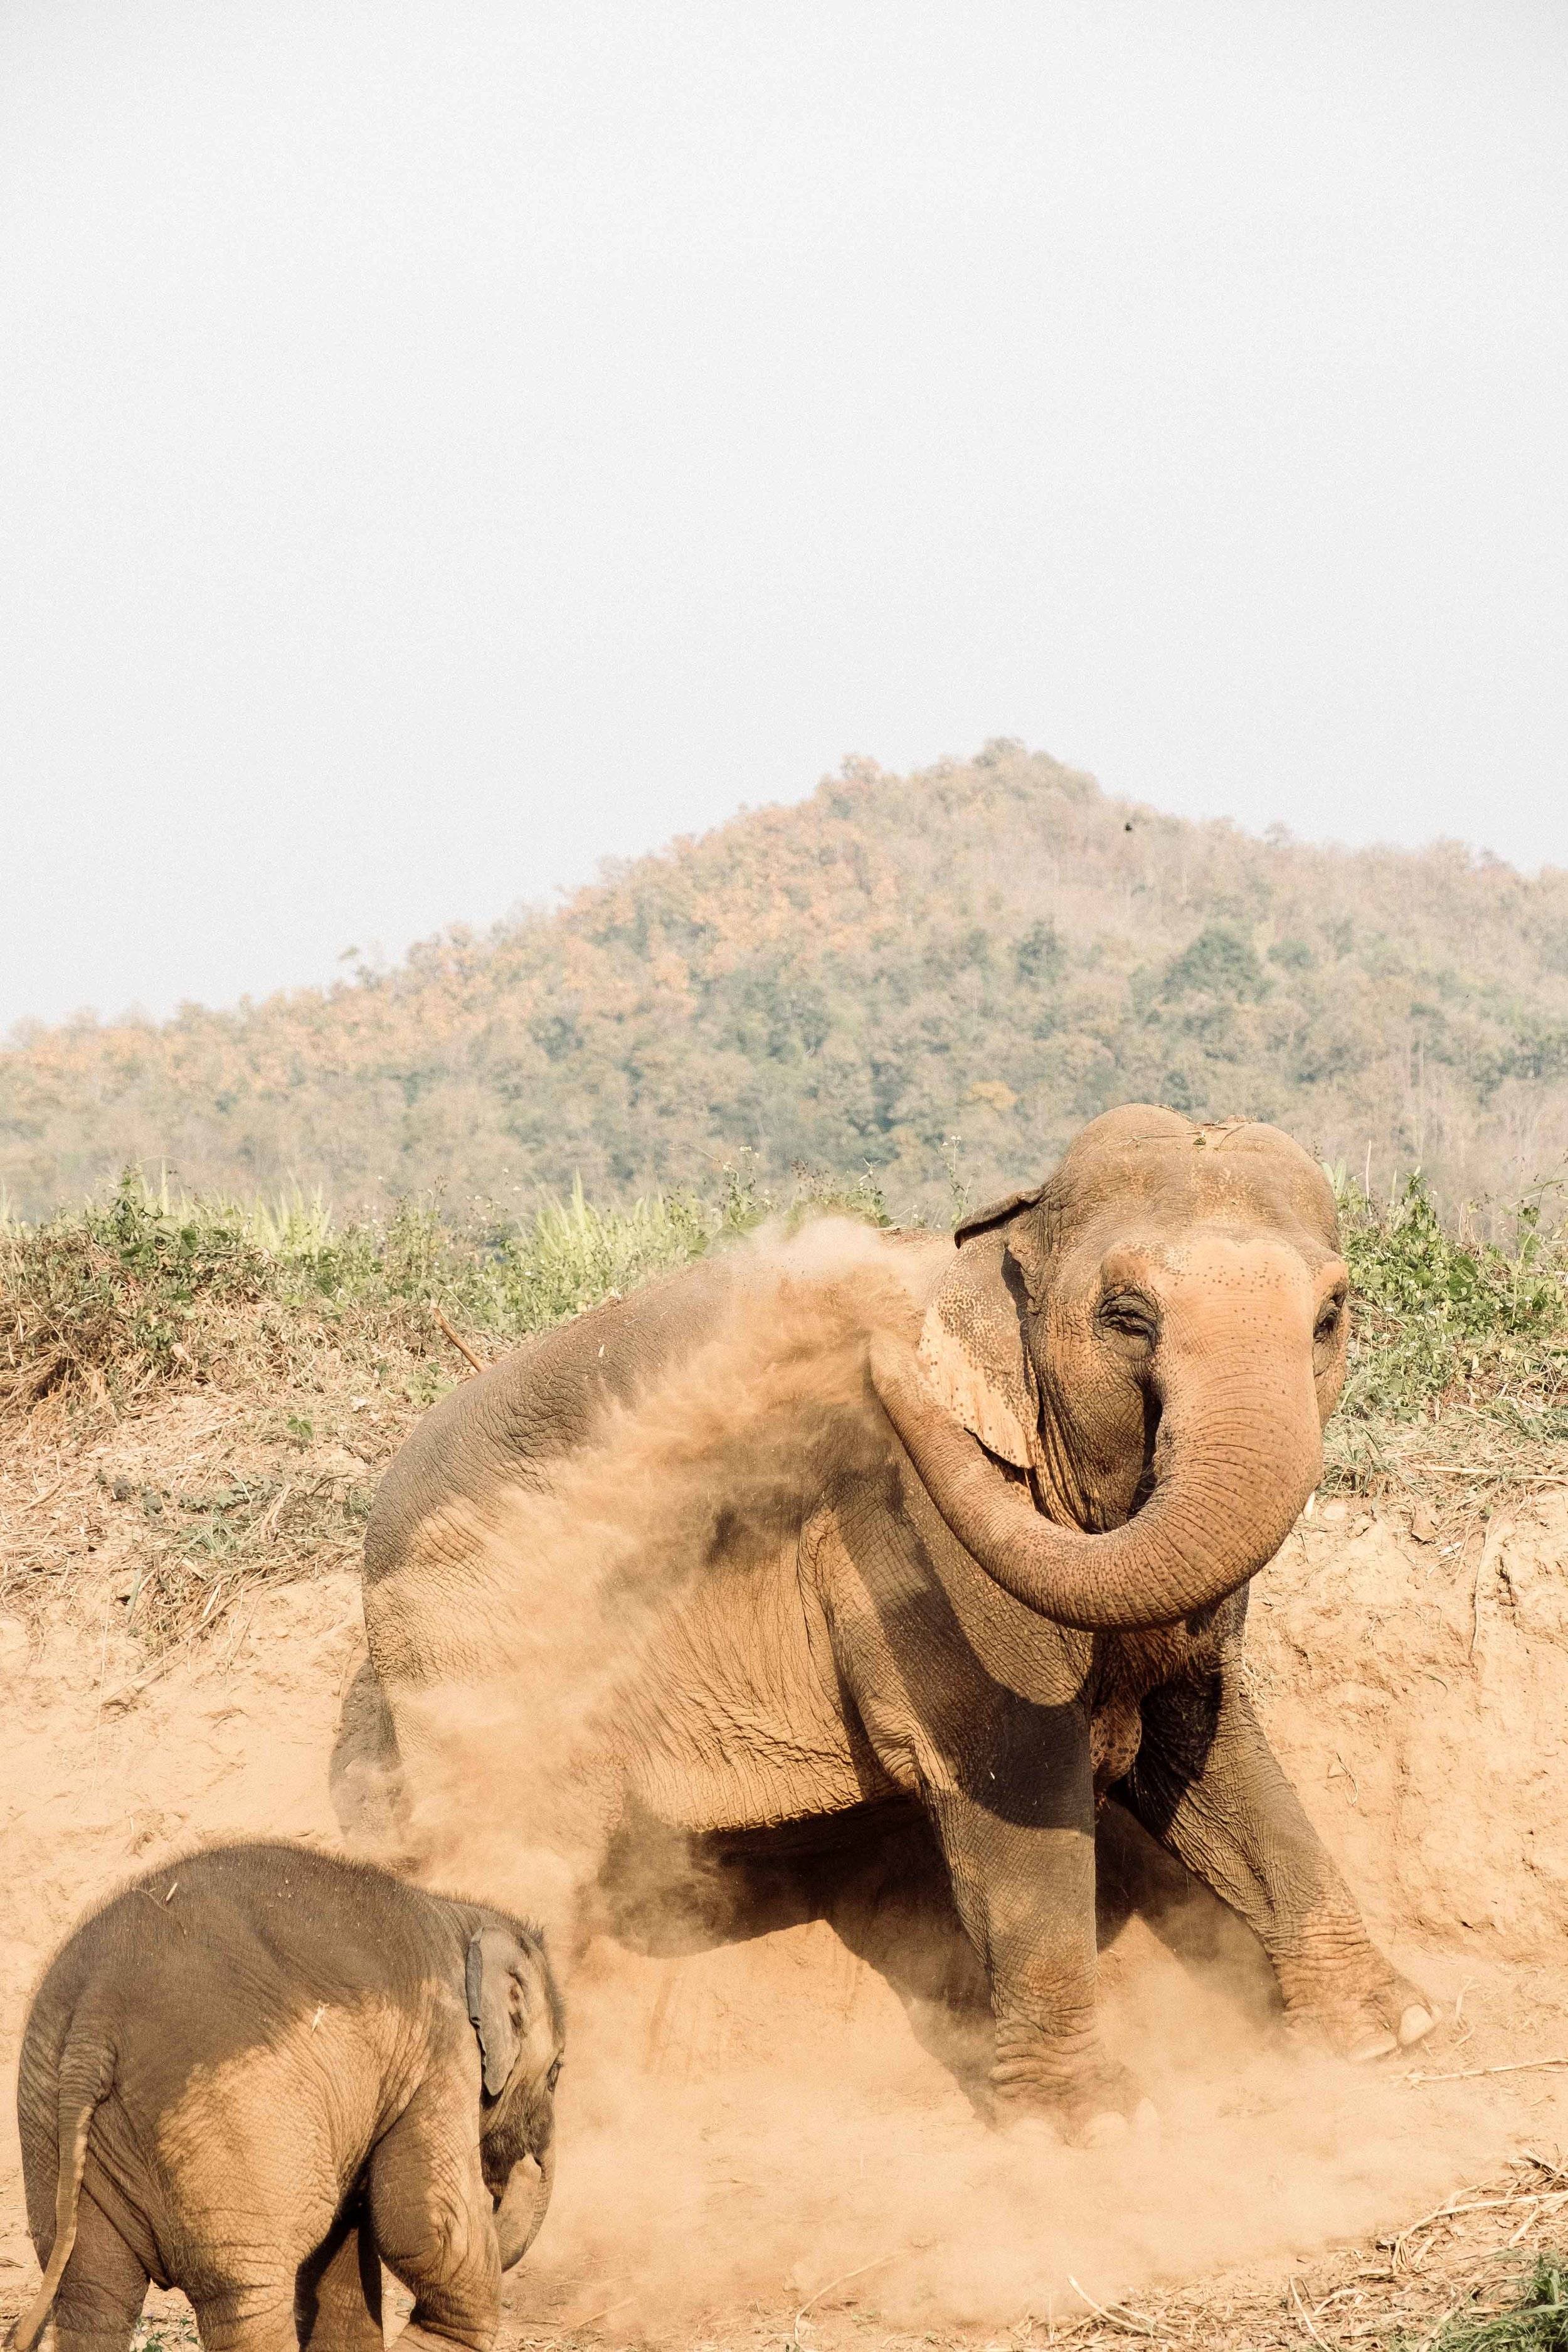 Elephants-5.jpg